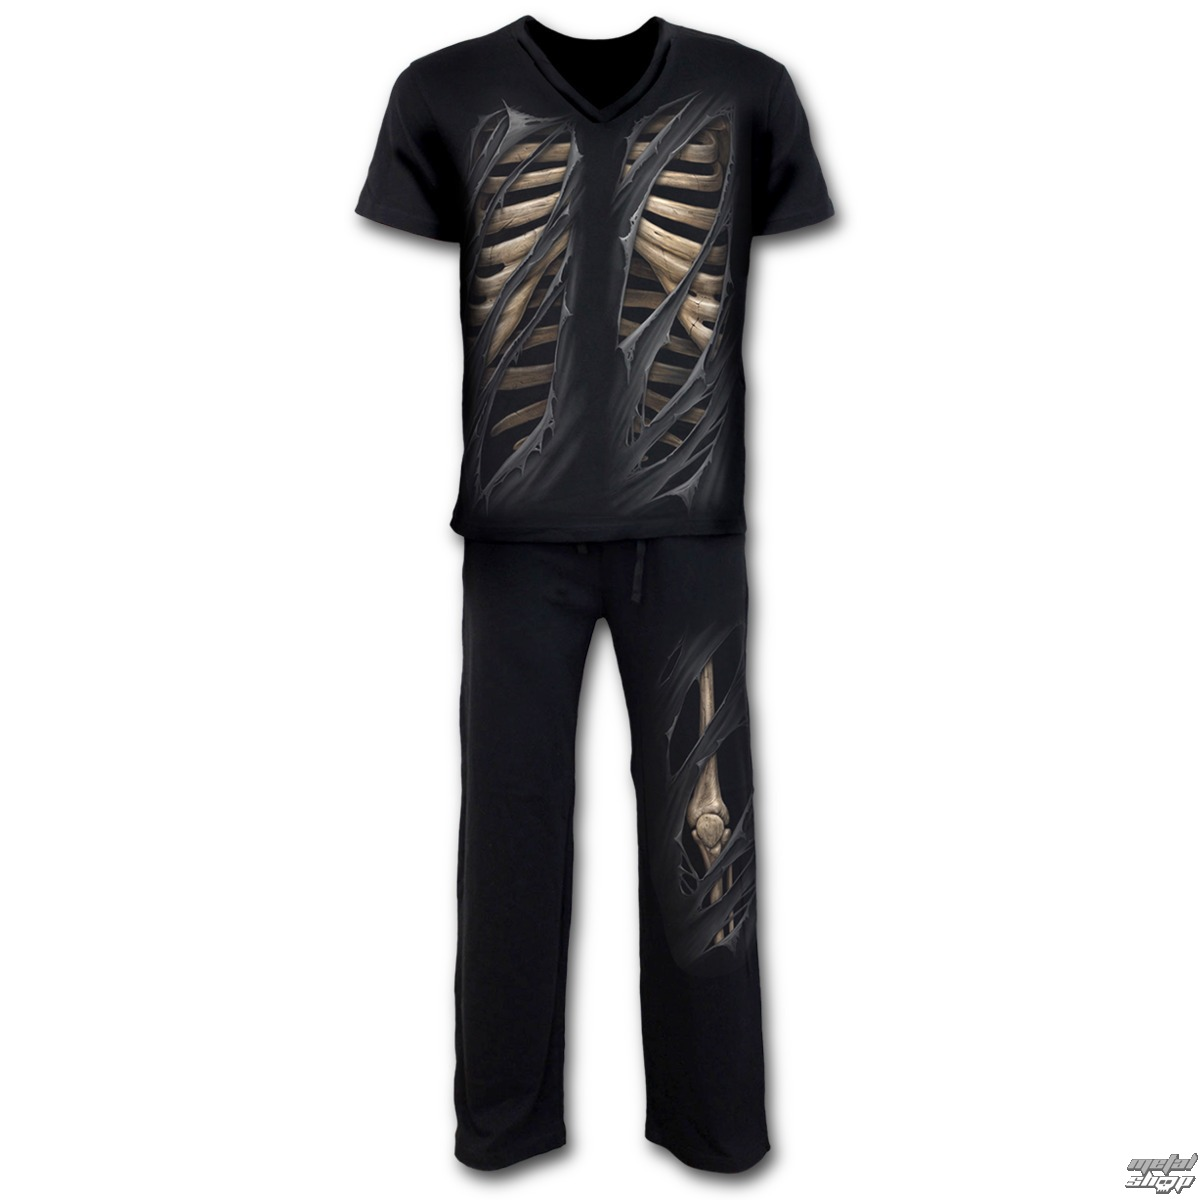 SPIRAL férfi pizsama szett - Bone Rips - K033M631 - Metalshop.hu e489275857